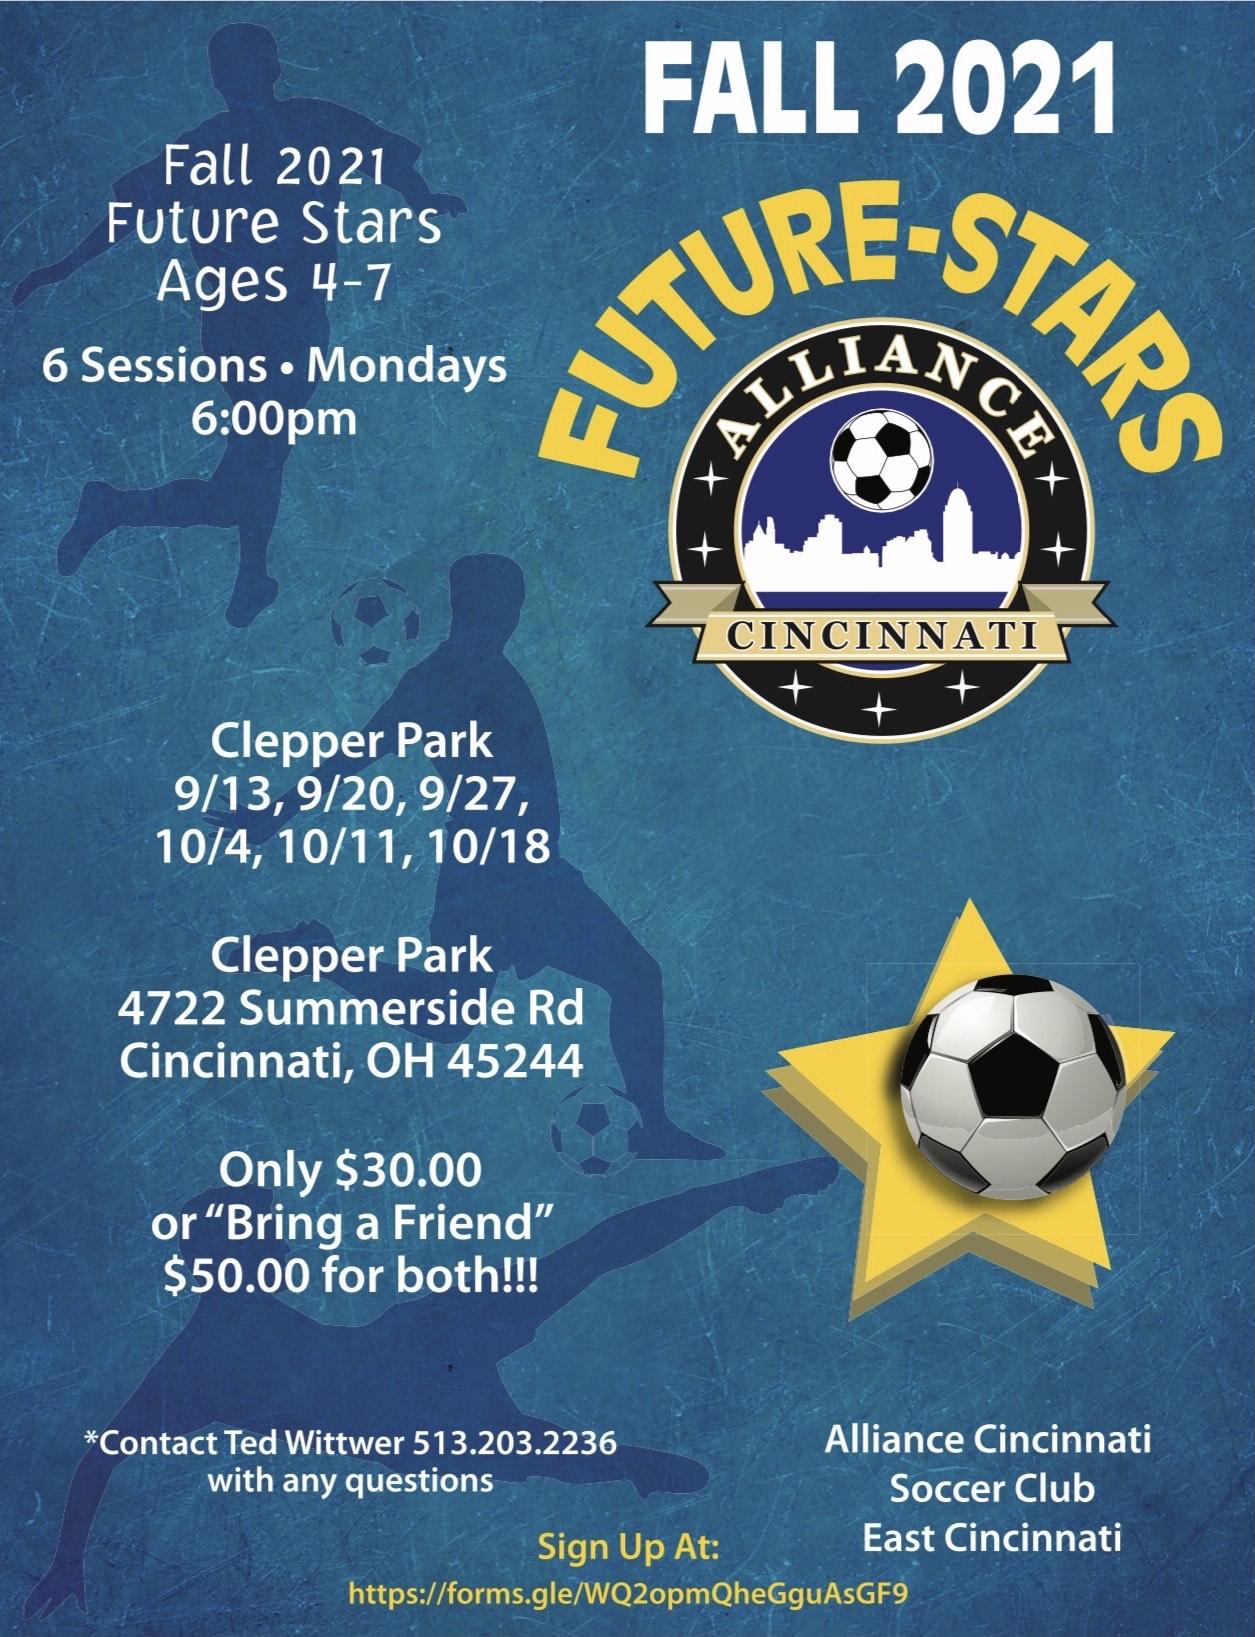 Alliance Cincinnati 2021 Fall Future Stars